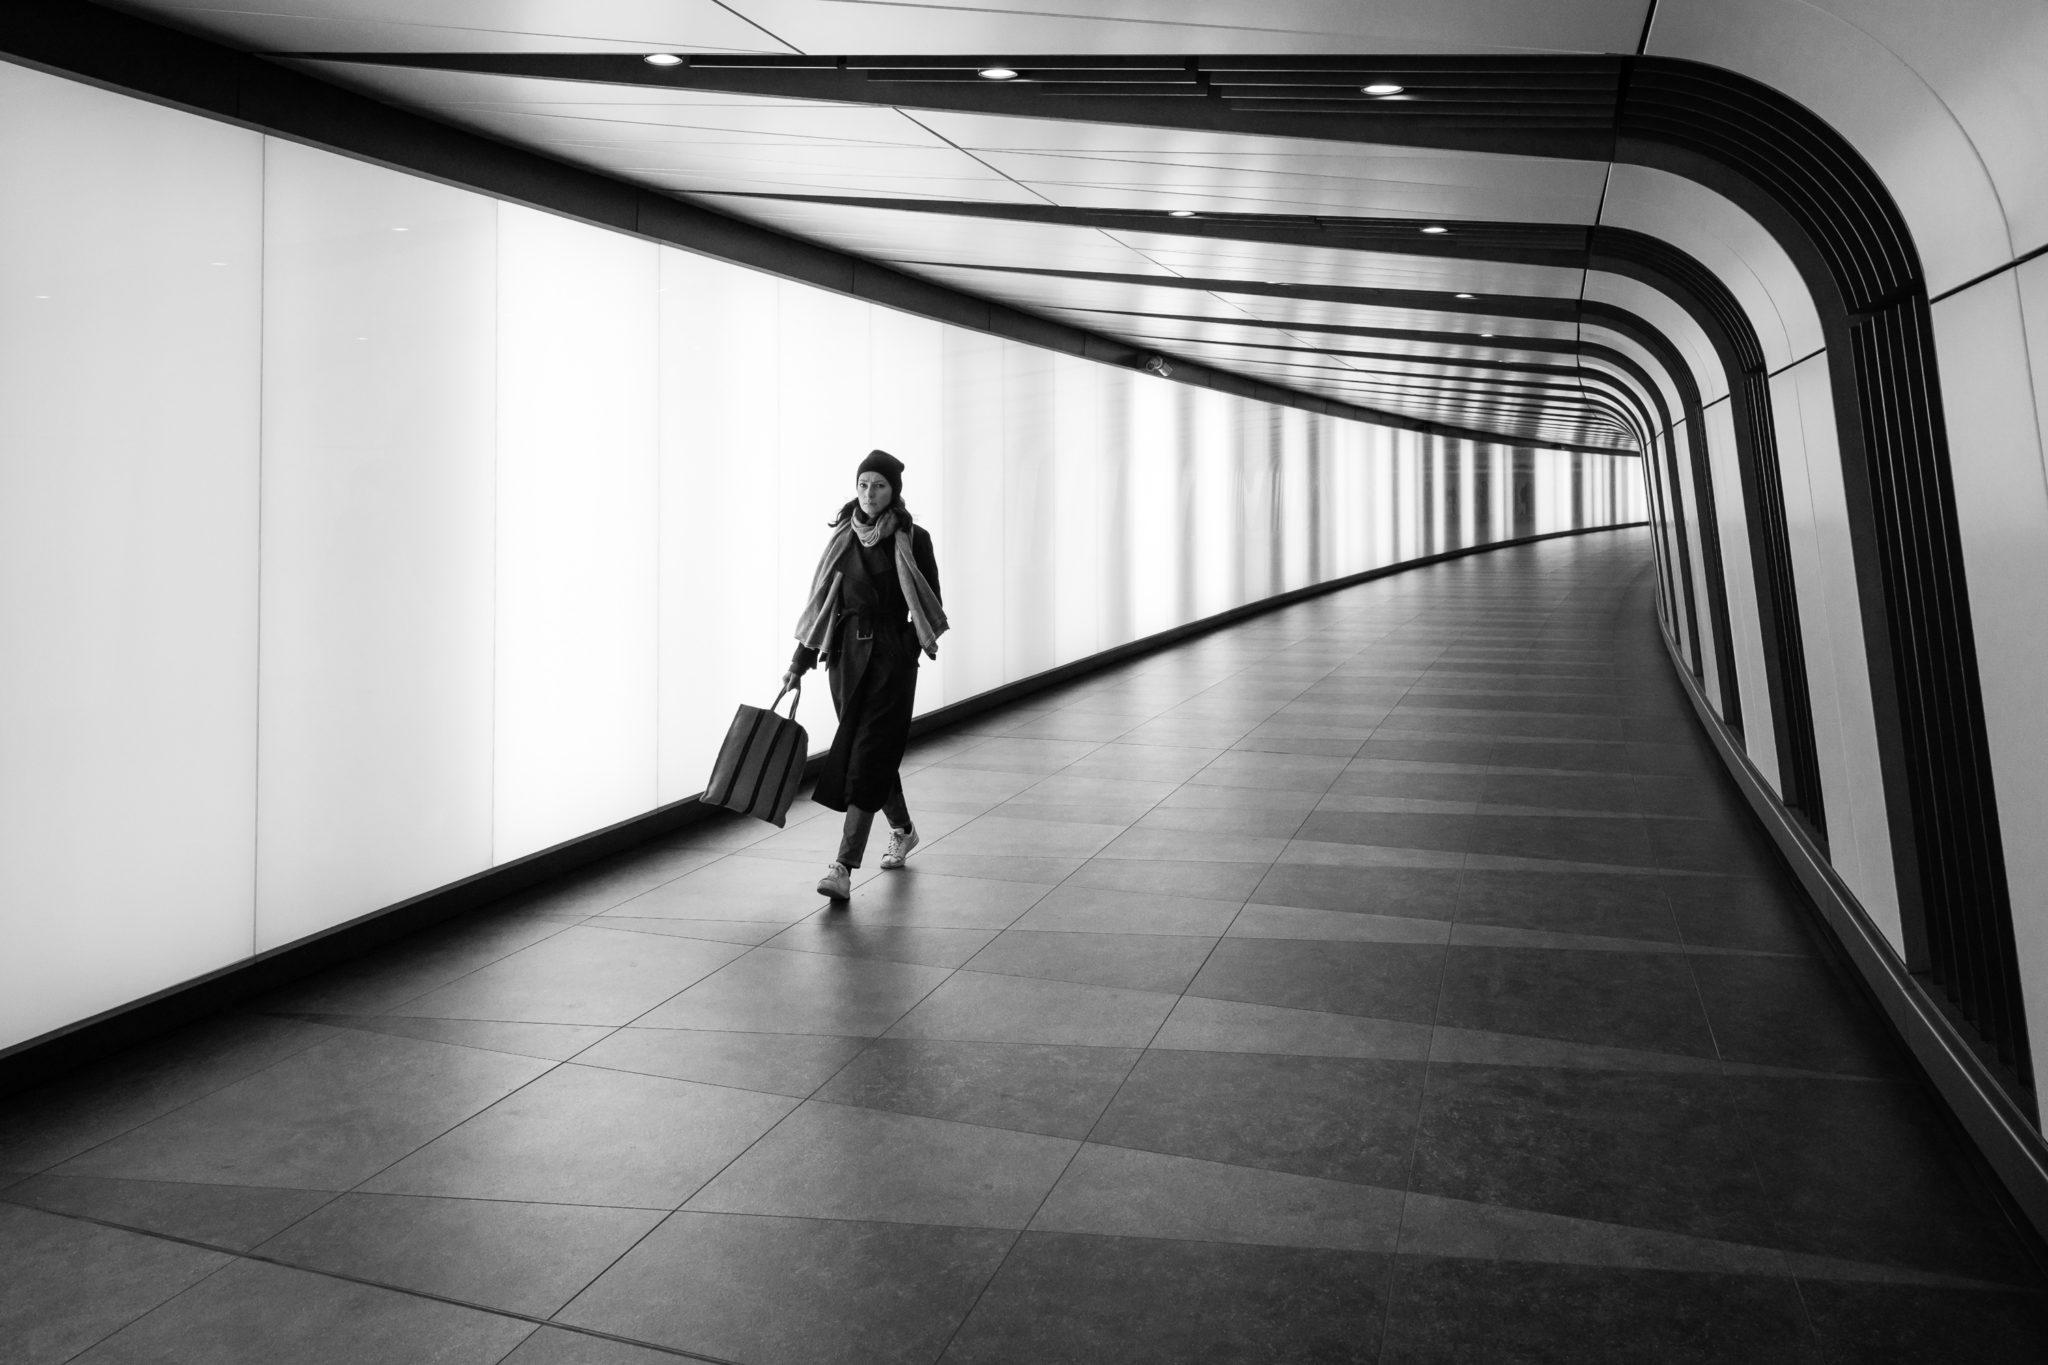 querformat-fotografie - Achim Katzberg - querformat-fotografie_MKG_VErnissage-026